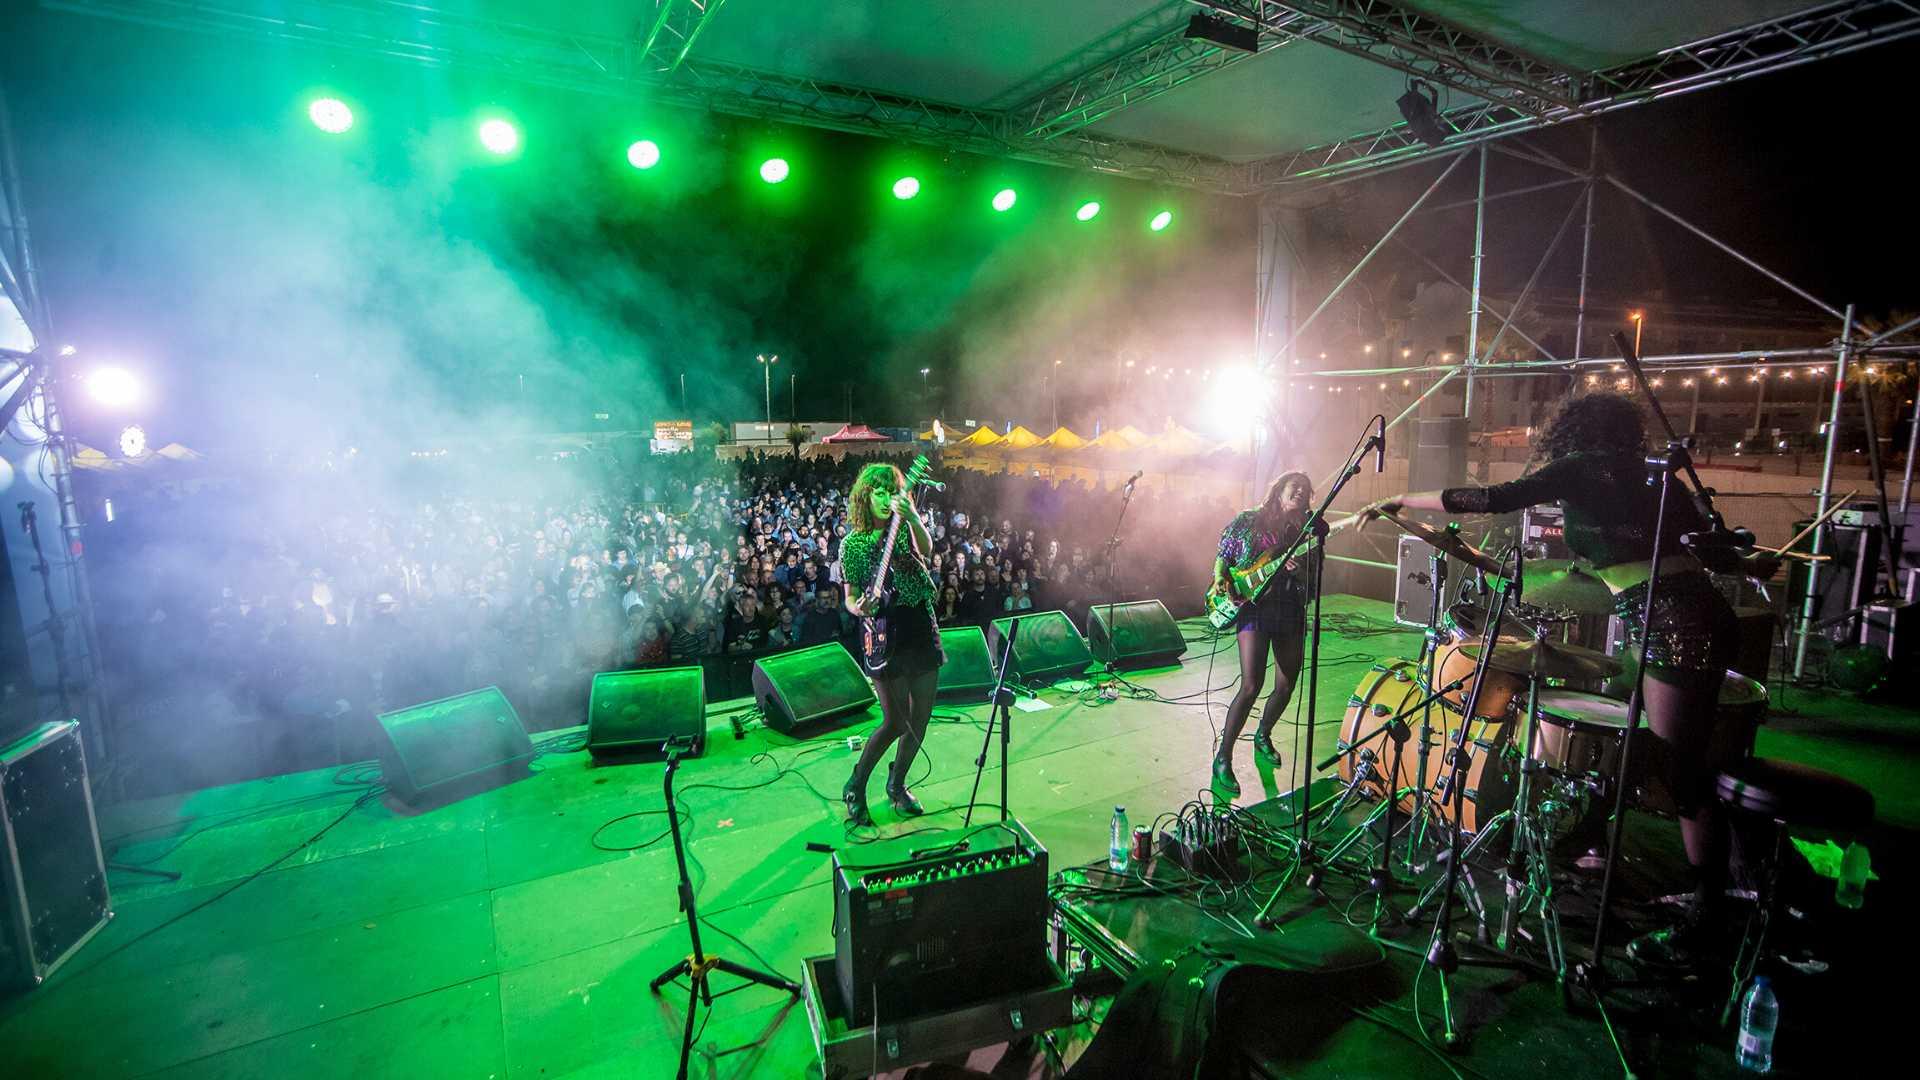 festival montgorock javea,